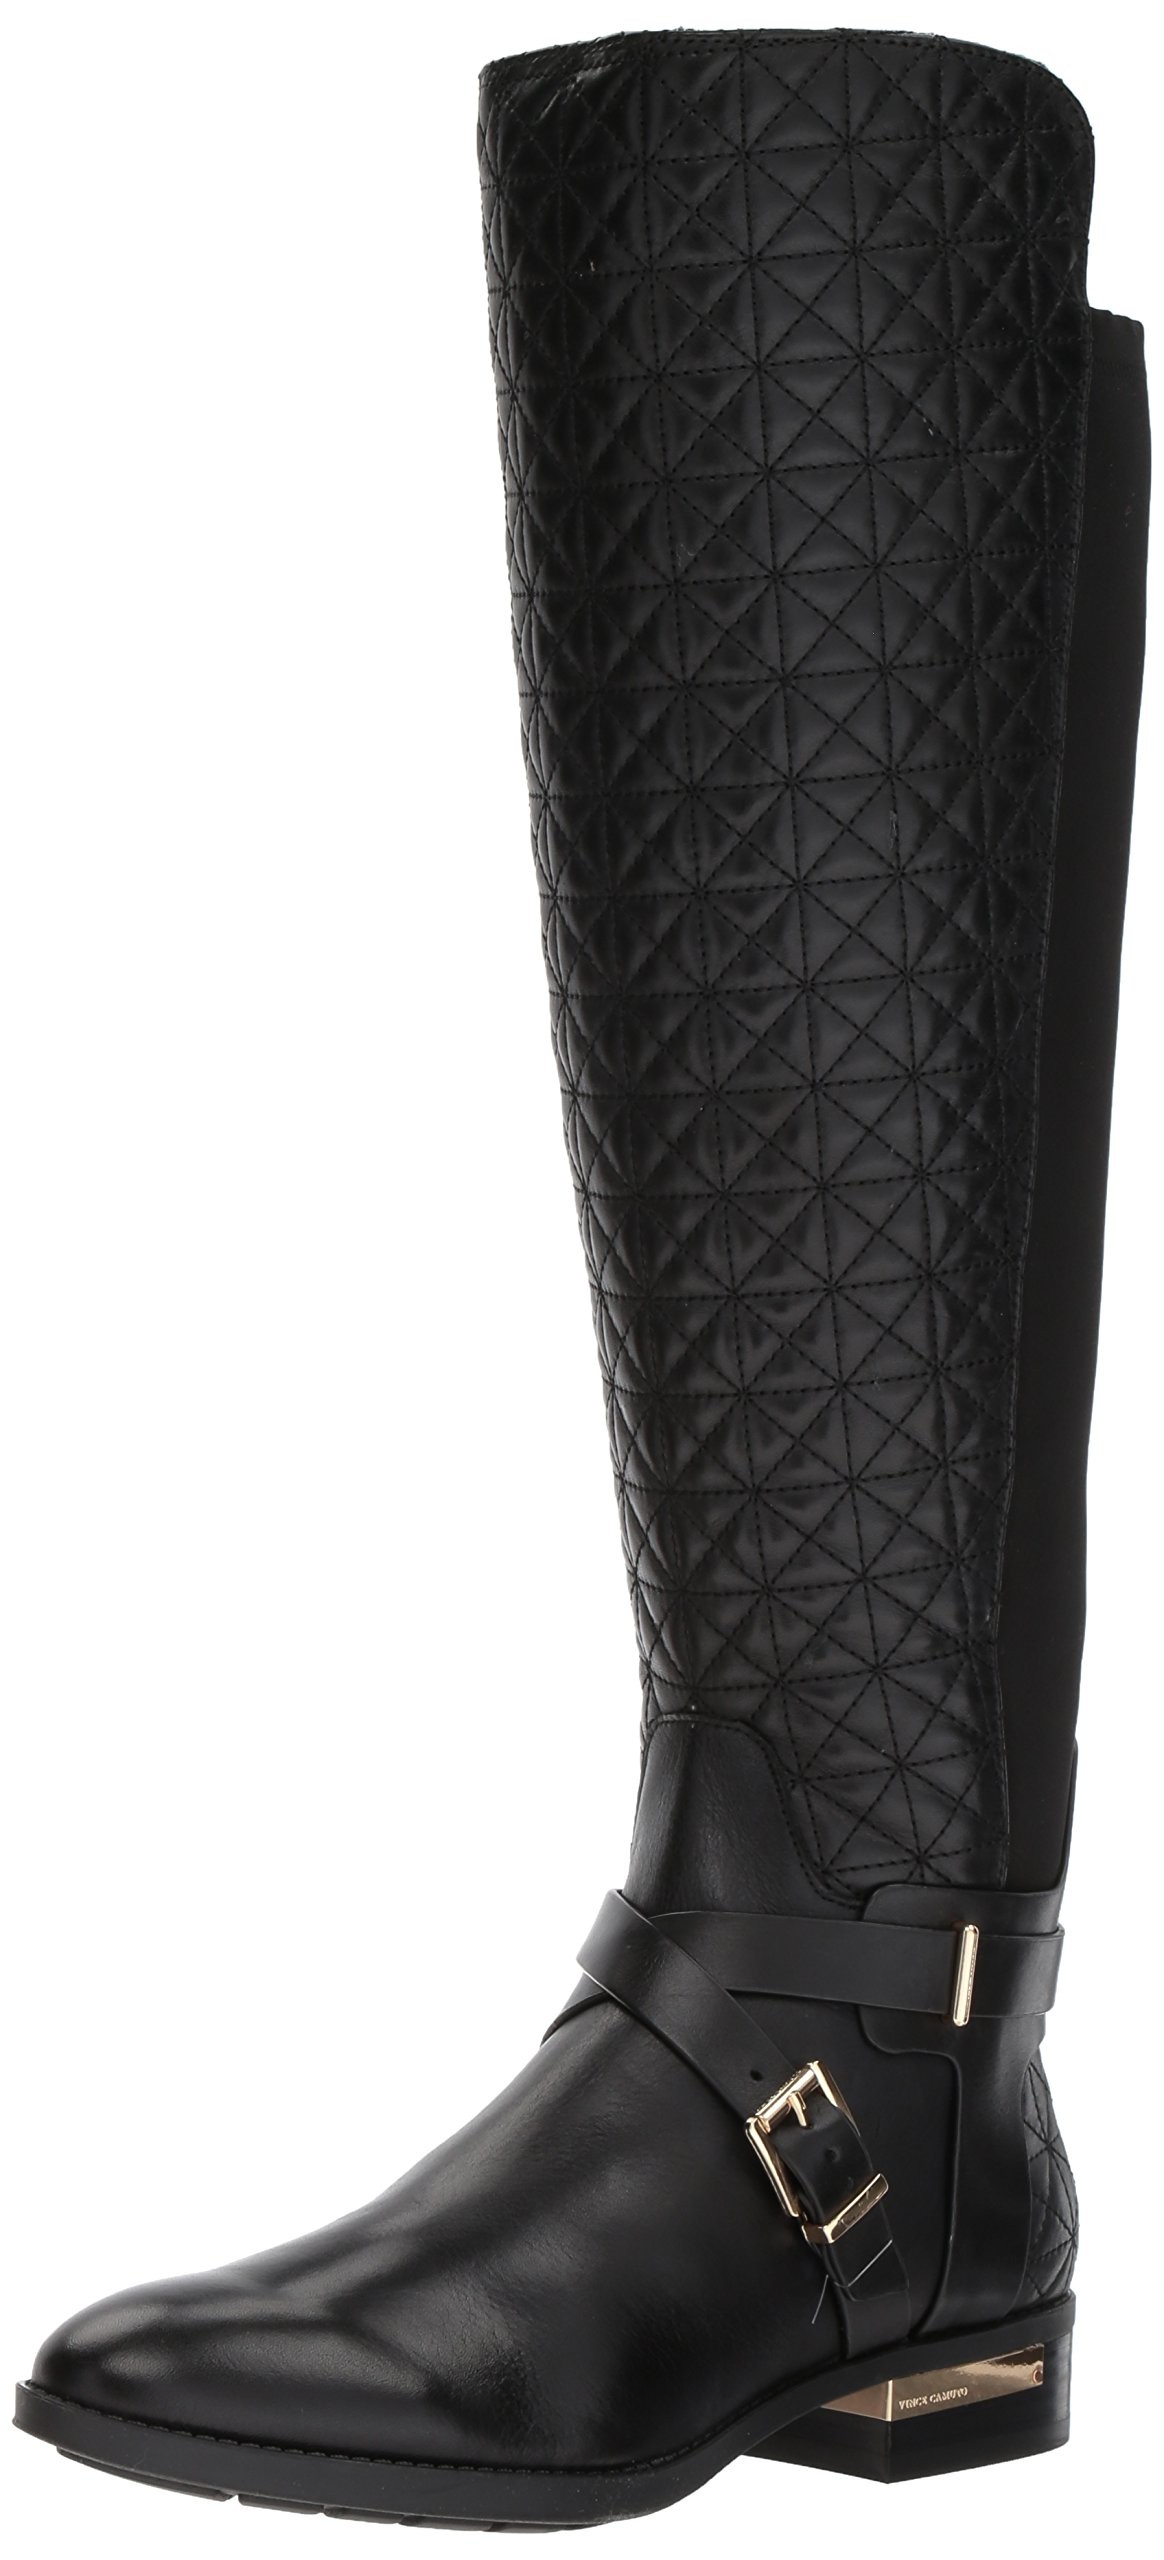 Vince Camuto Women's Patira Fashion Boot, Black Wide Calf, 9 Medium US